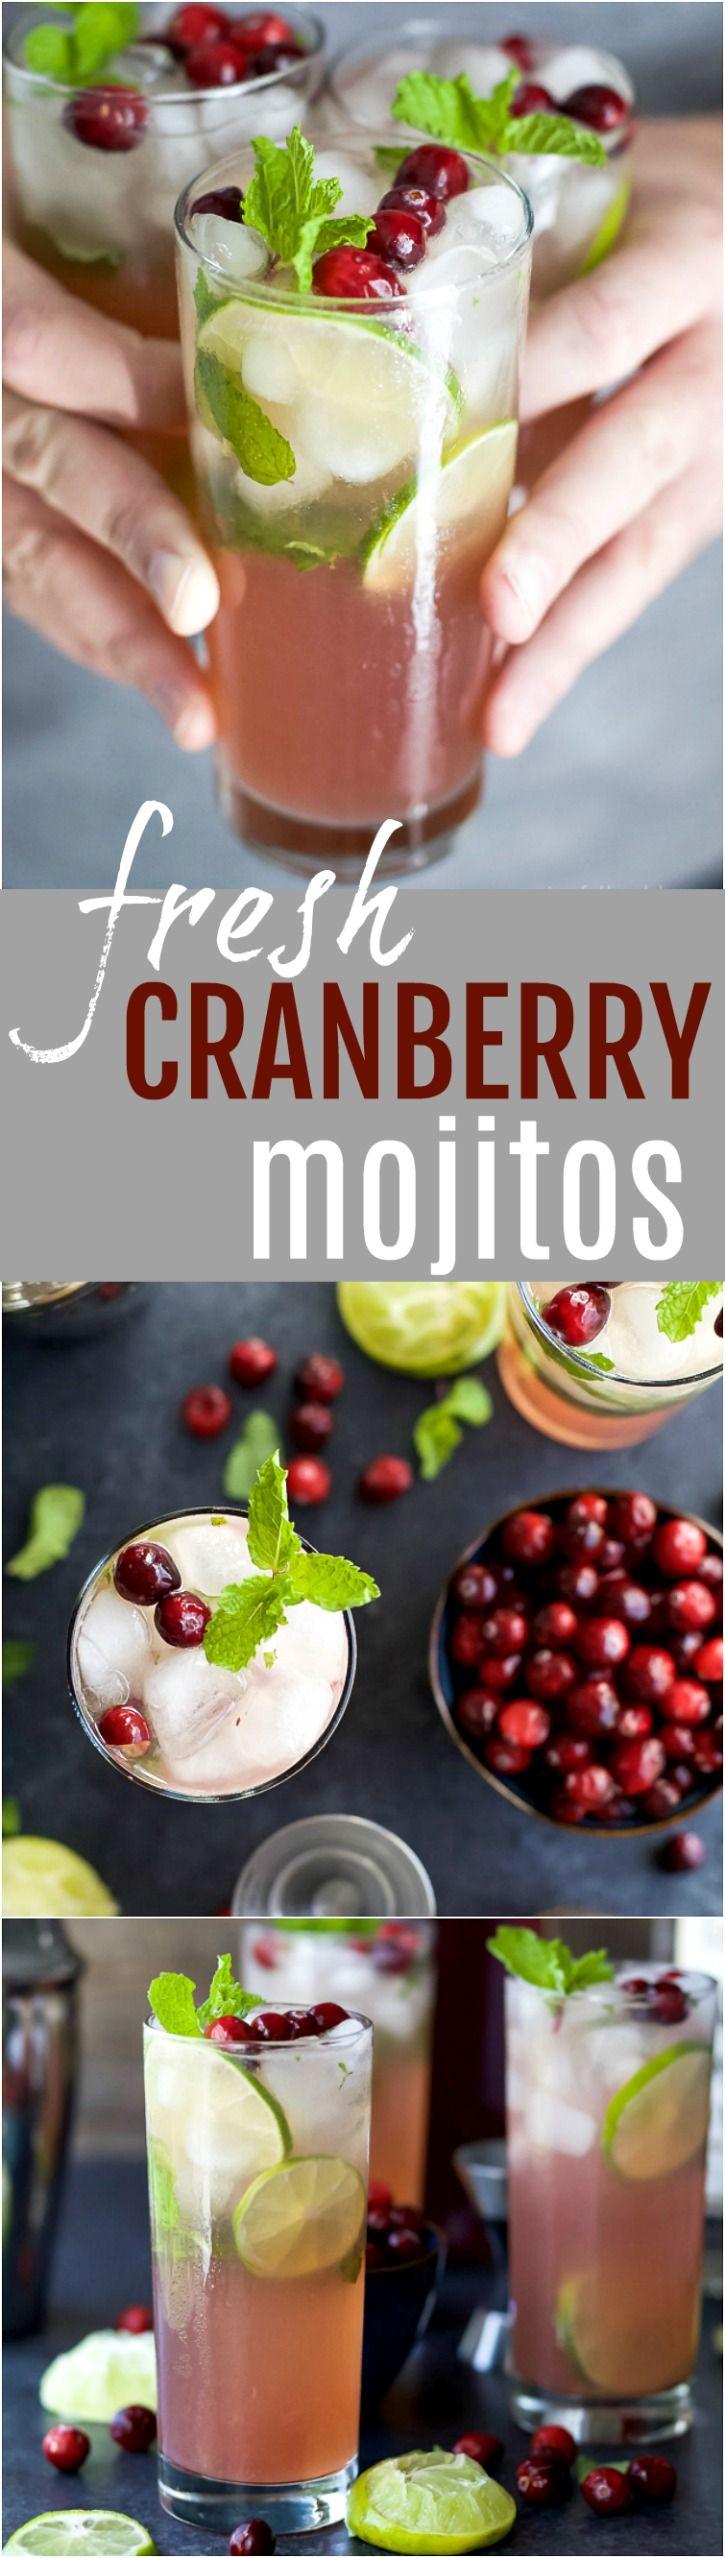 Fresh Cranberry Mojitos | Easy Holiday Cocktail Recipe